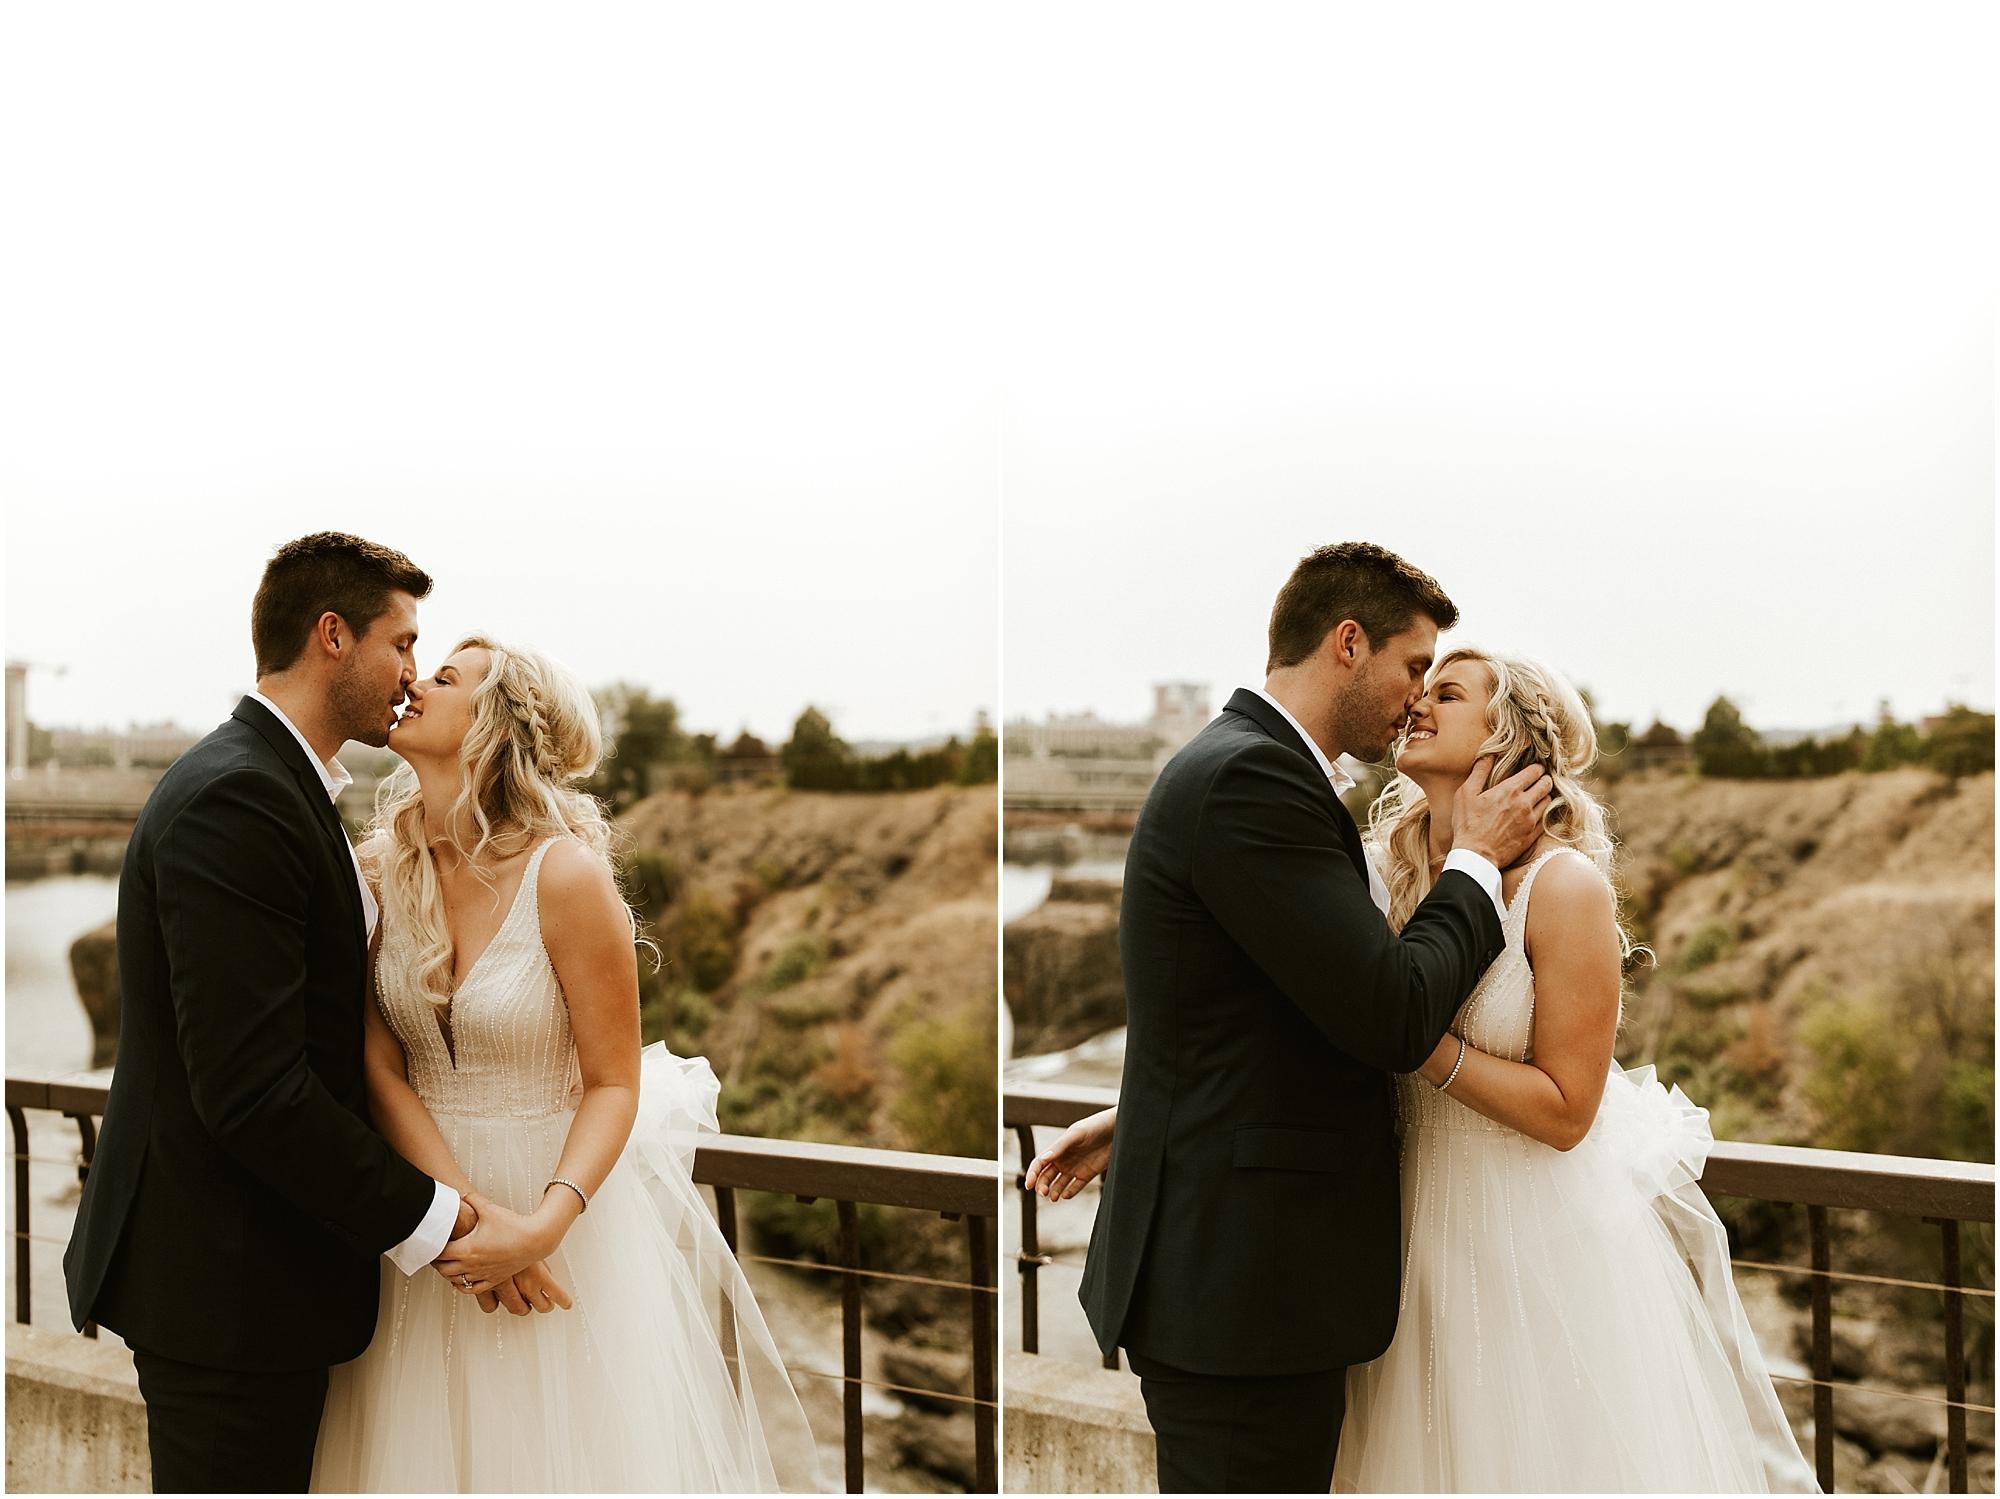 Chateau Rive Spokane Wedding Cassie Trottier Photography1032.jpg